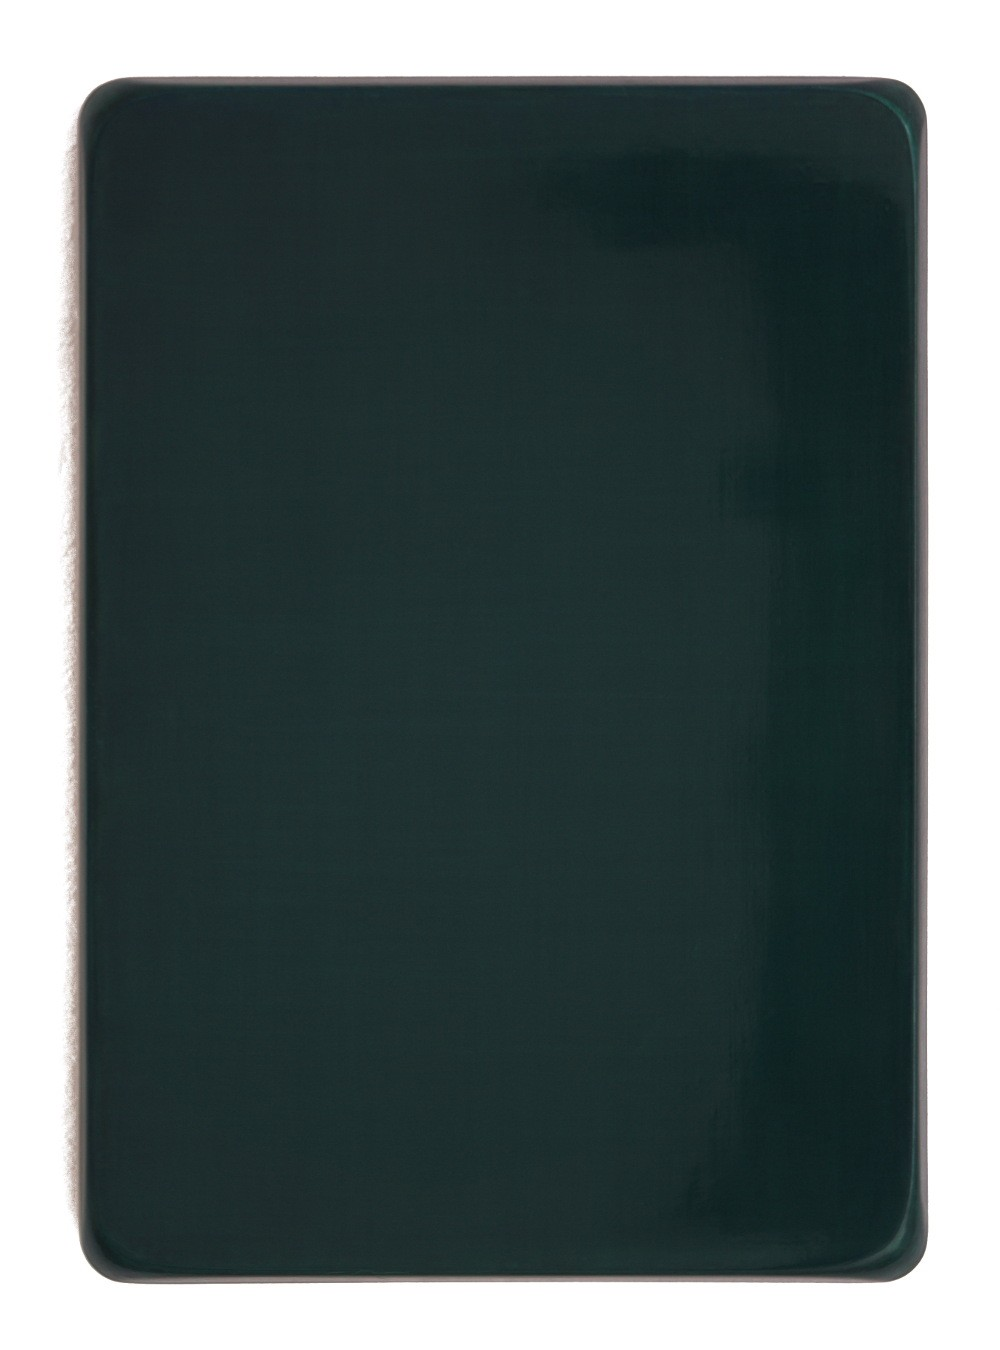 o.T. / Neutralgrau, Helioceolinblau, Heliotürkis, Chromoxidgrün feurig, Perlglanz Pyrisma grün, Aquarell auf Gips und Medium, 35 x 25 cm, 2013